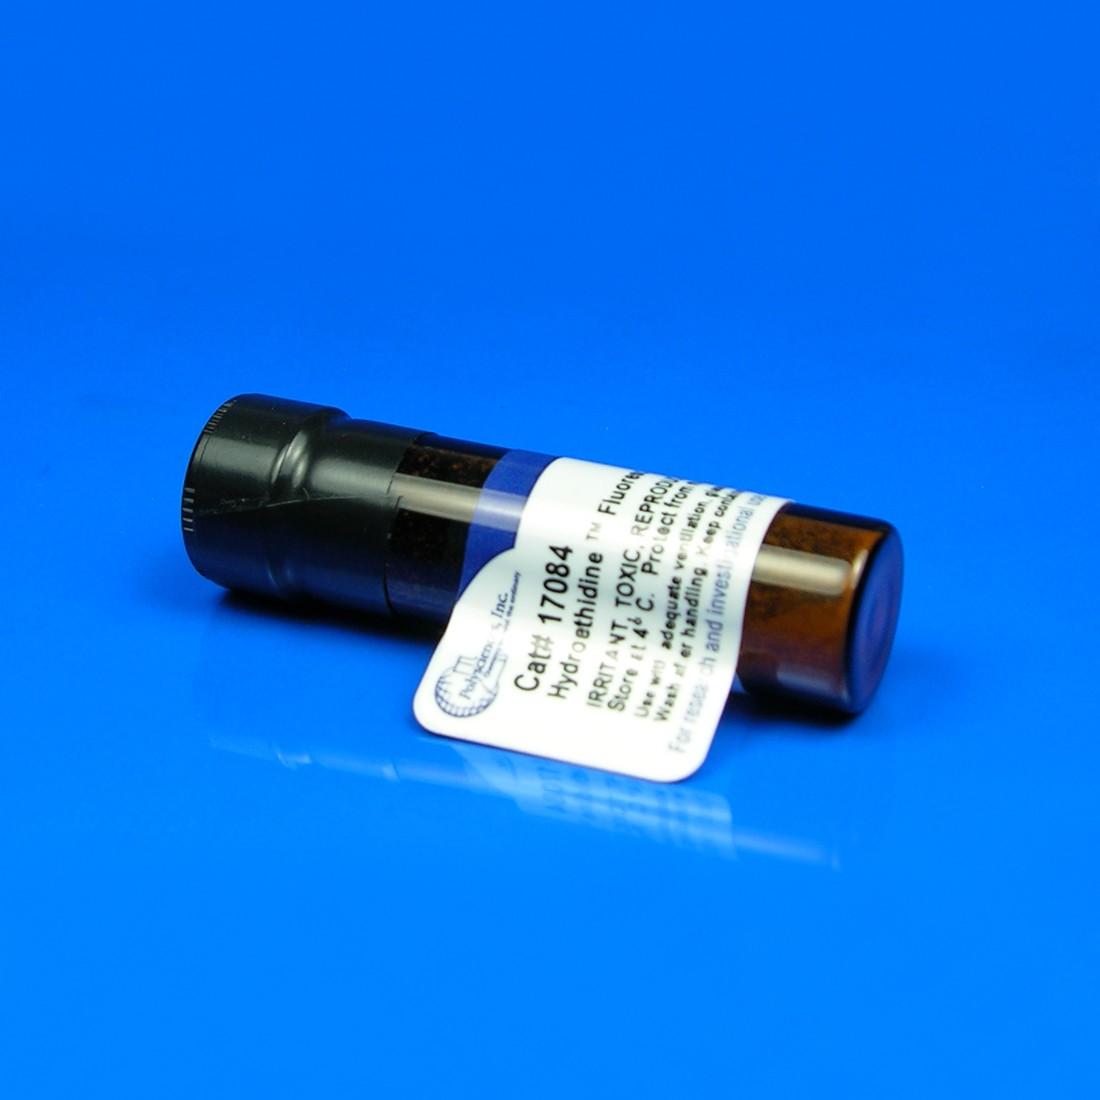 Hydroethidine™ (Dihydroethidium bromide)